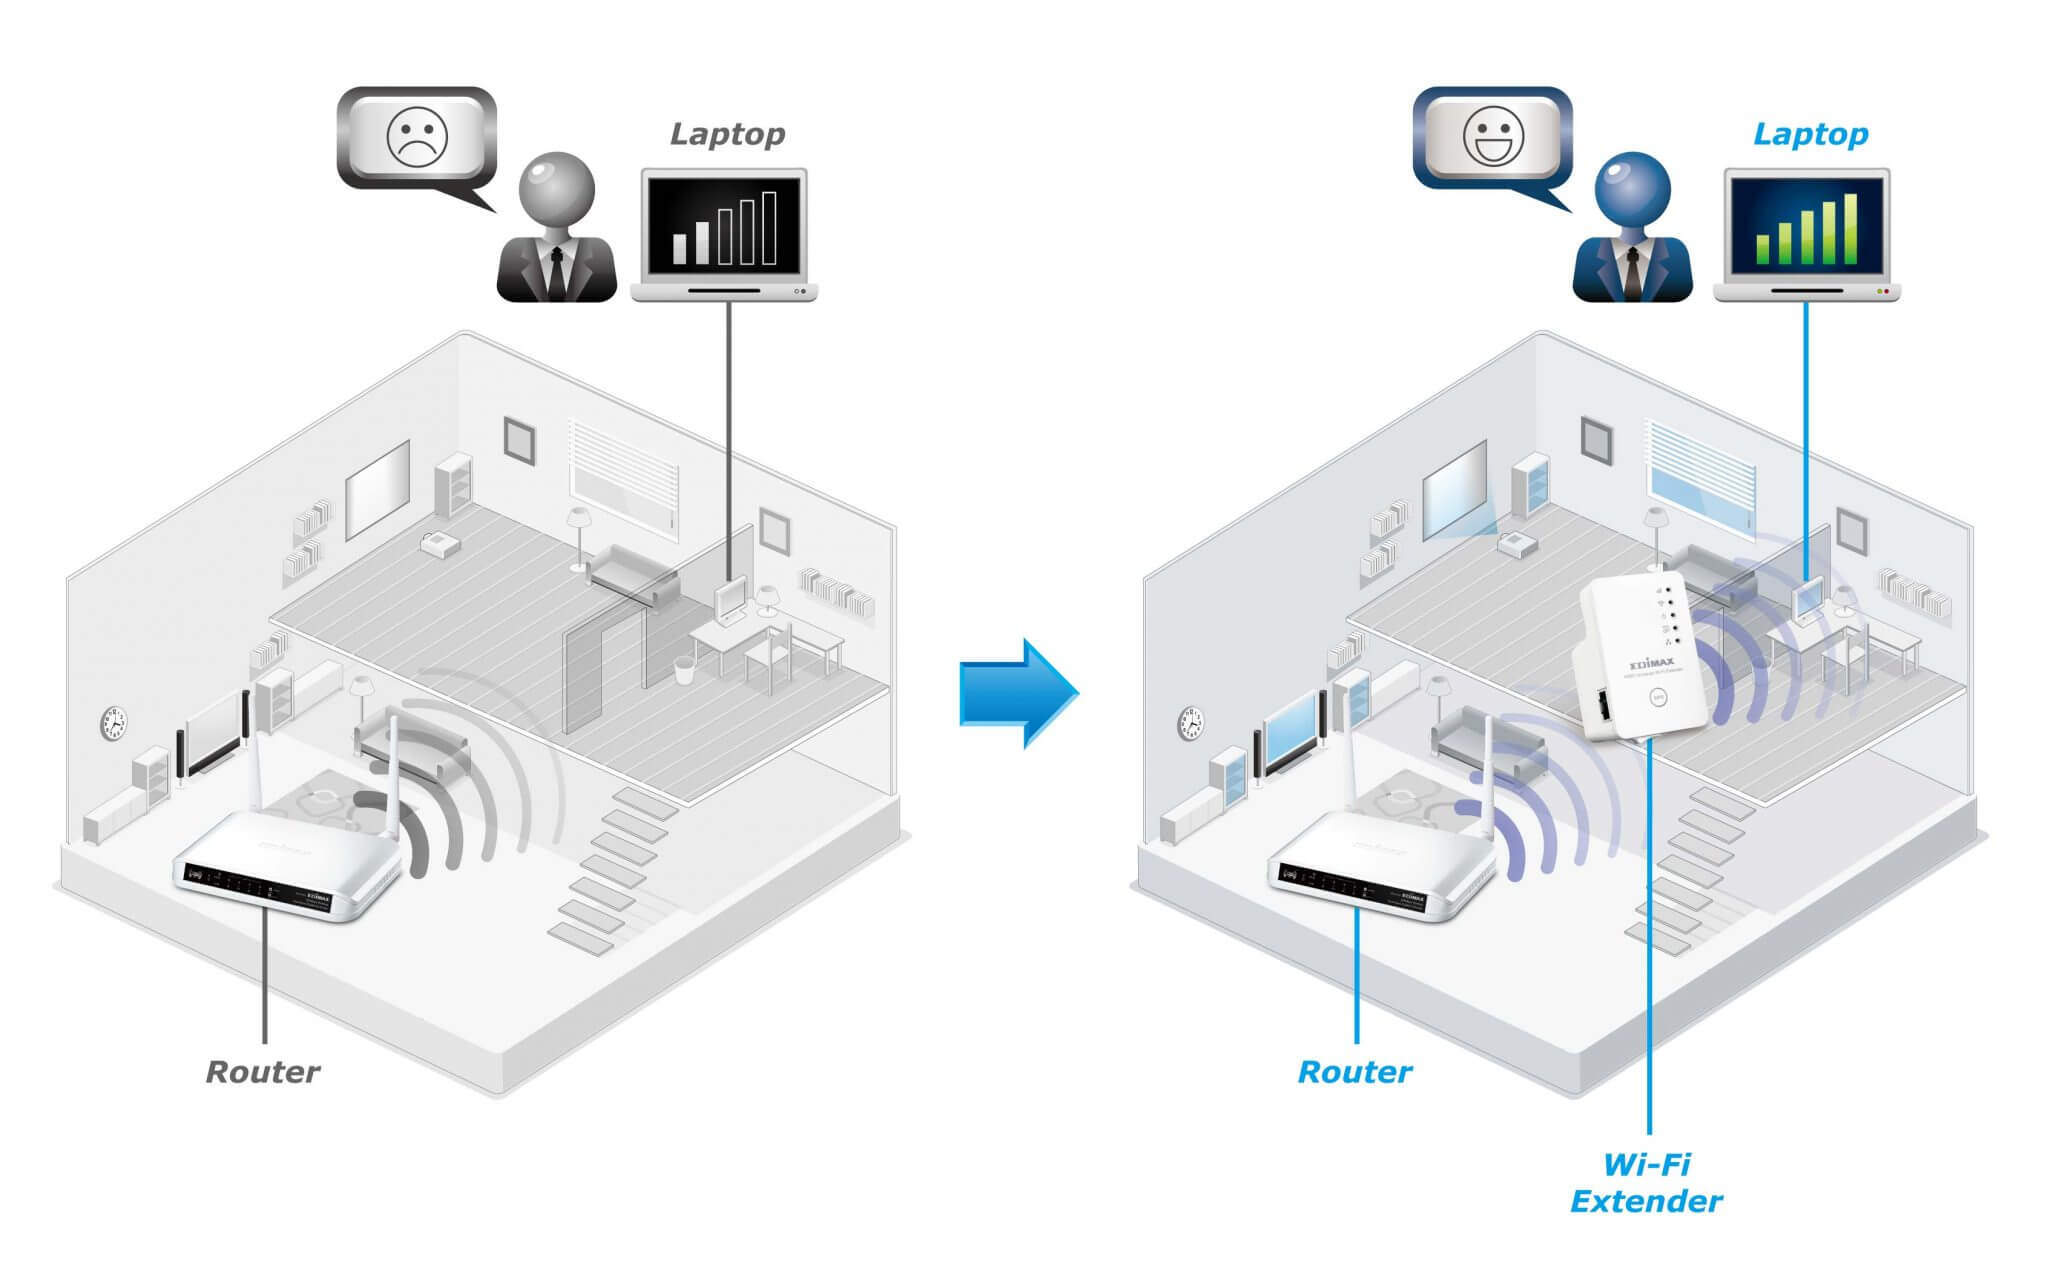 Retea Wi-Fi in locuinta acoperire maxima